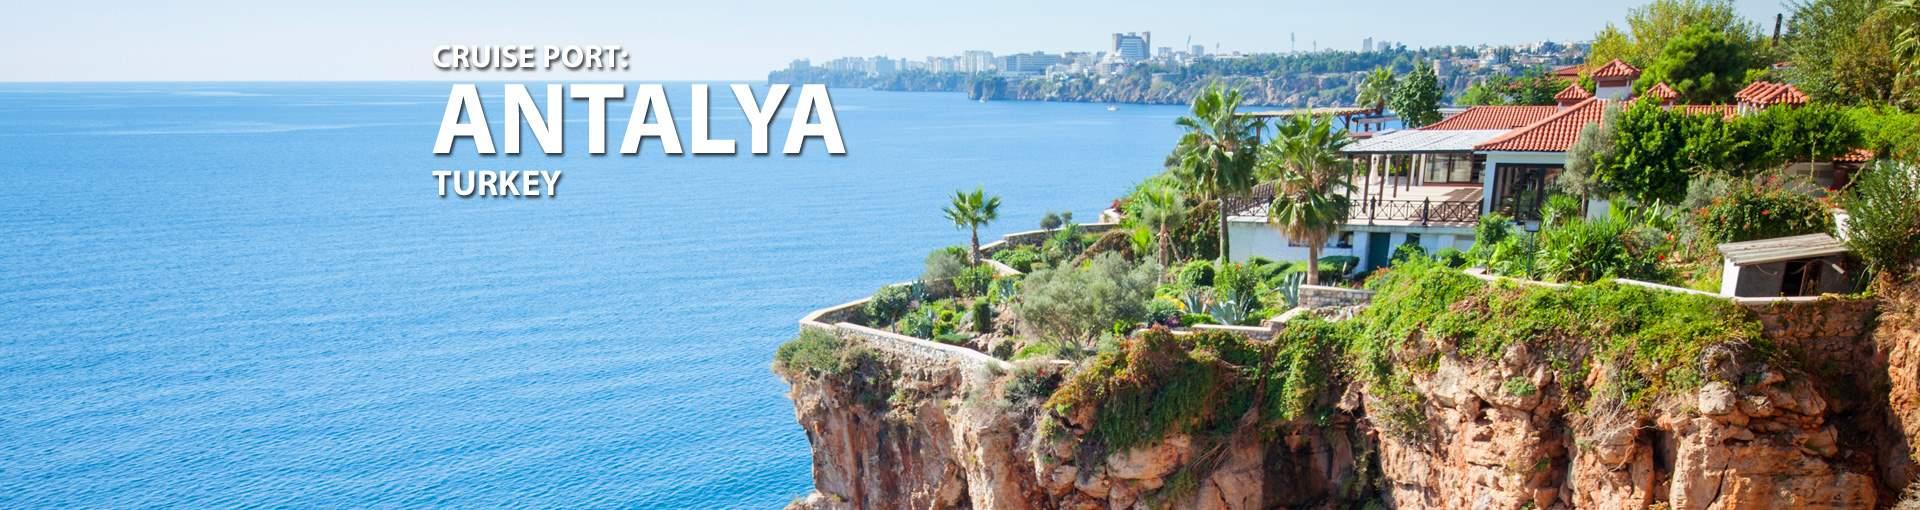 Cruises to Antalya, Turkey